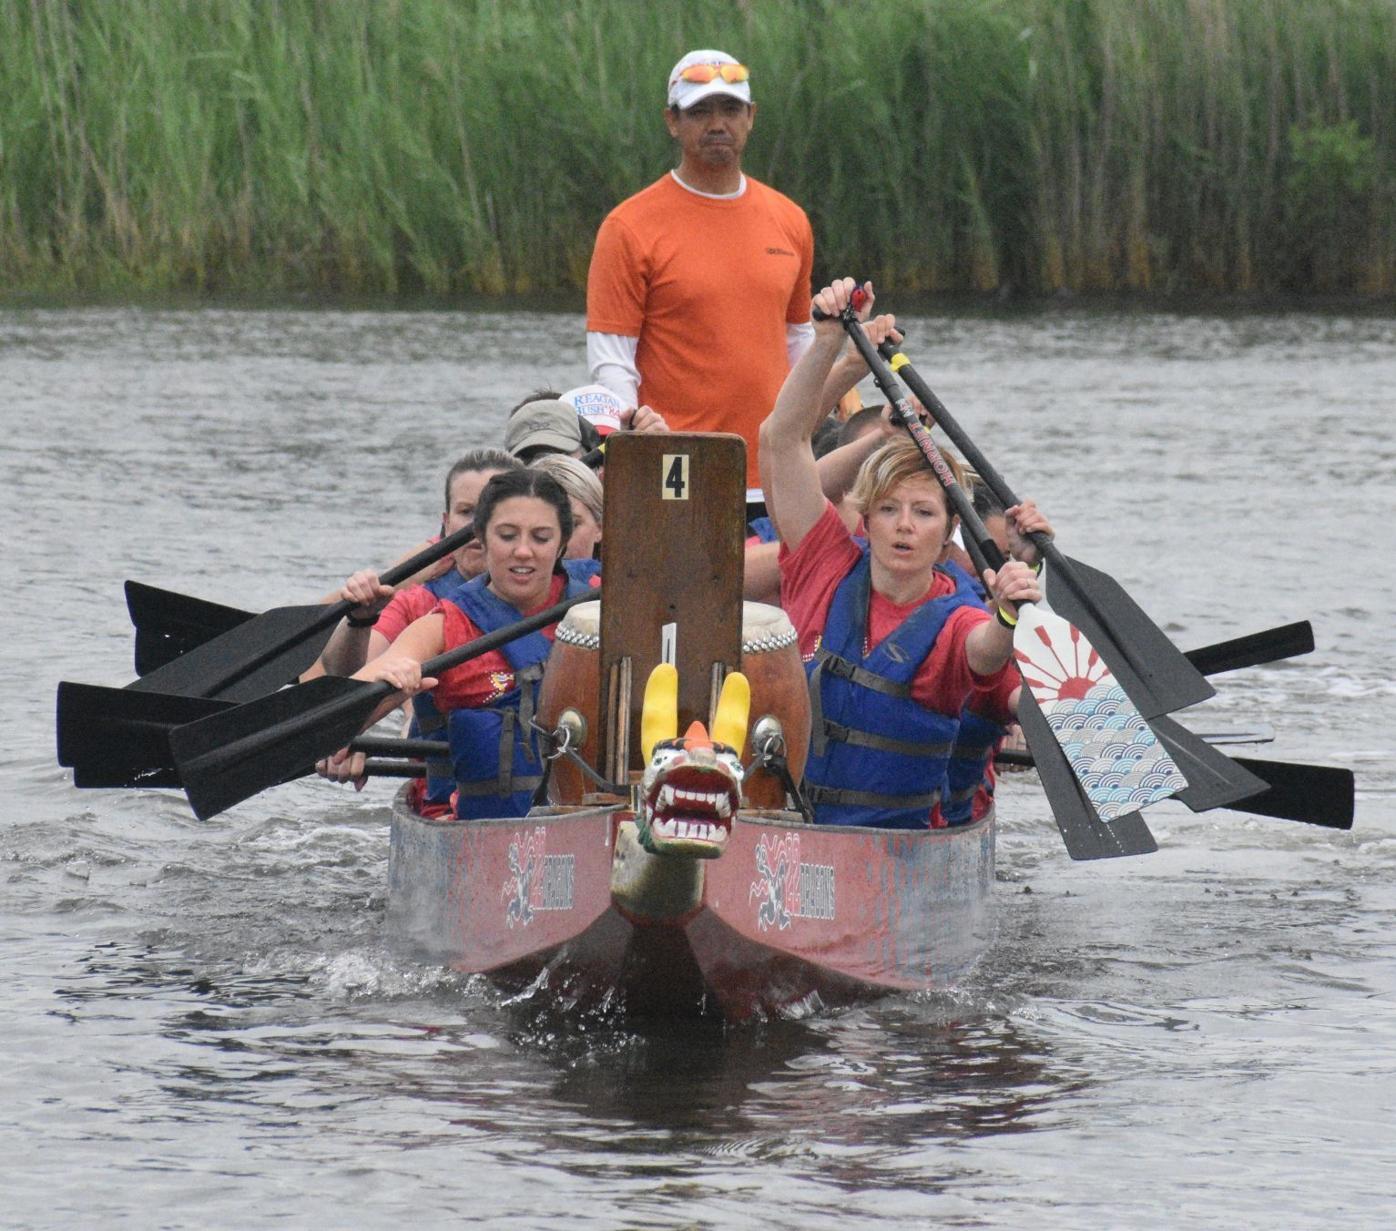 Worth paddling for